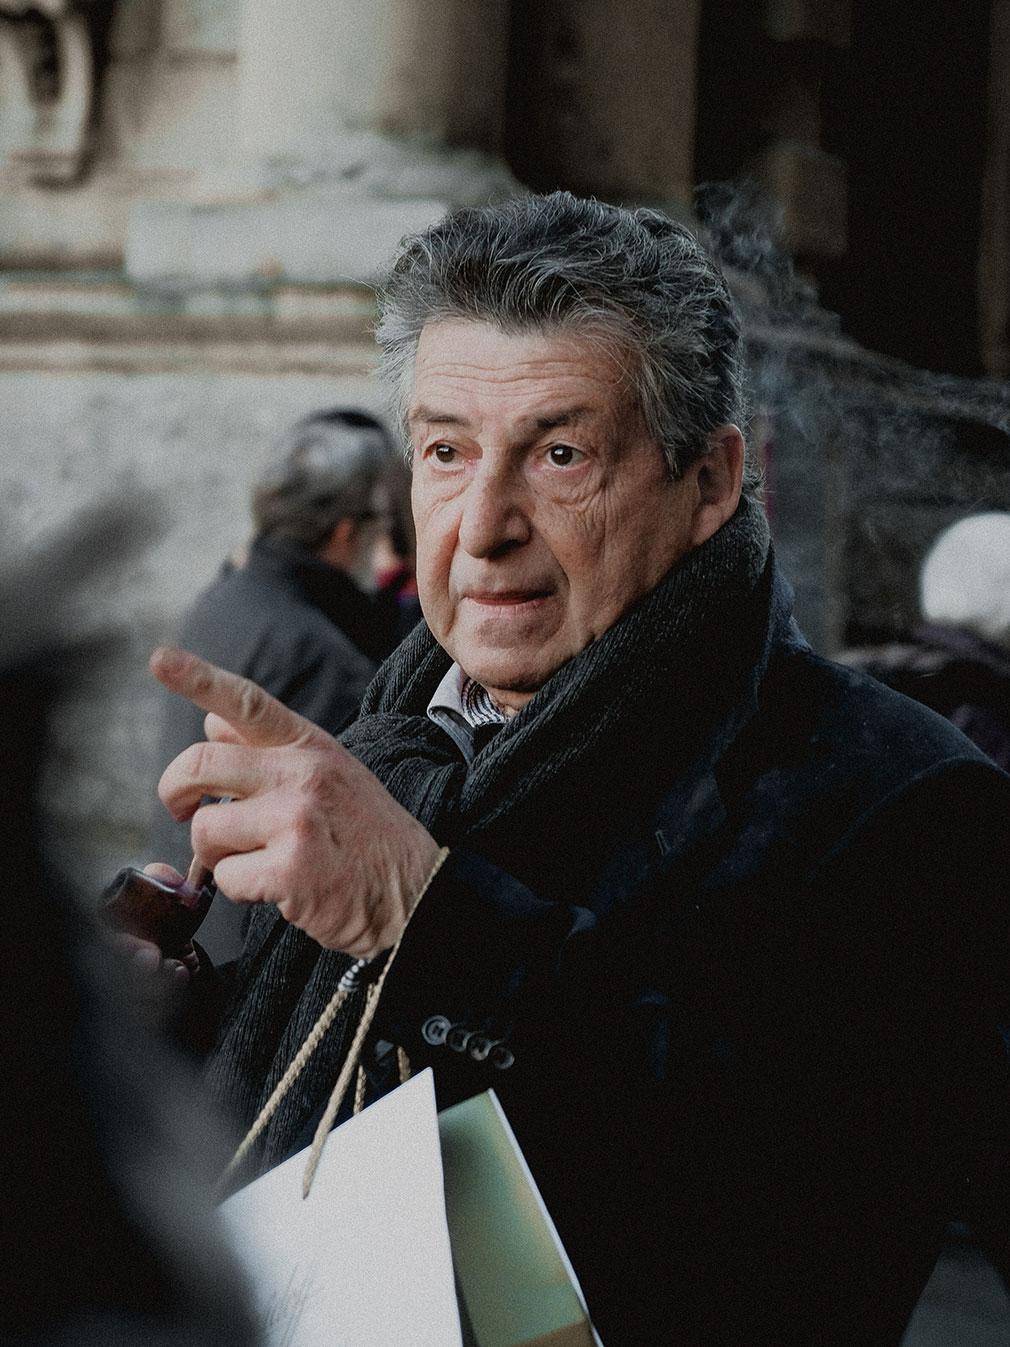 A man with a cigar, Italia, Milano